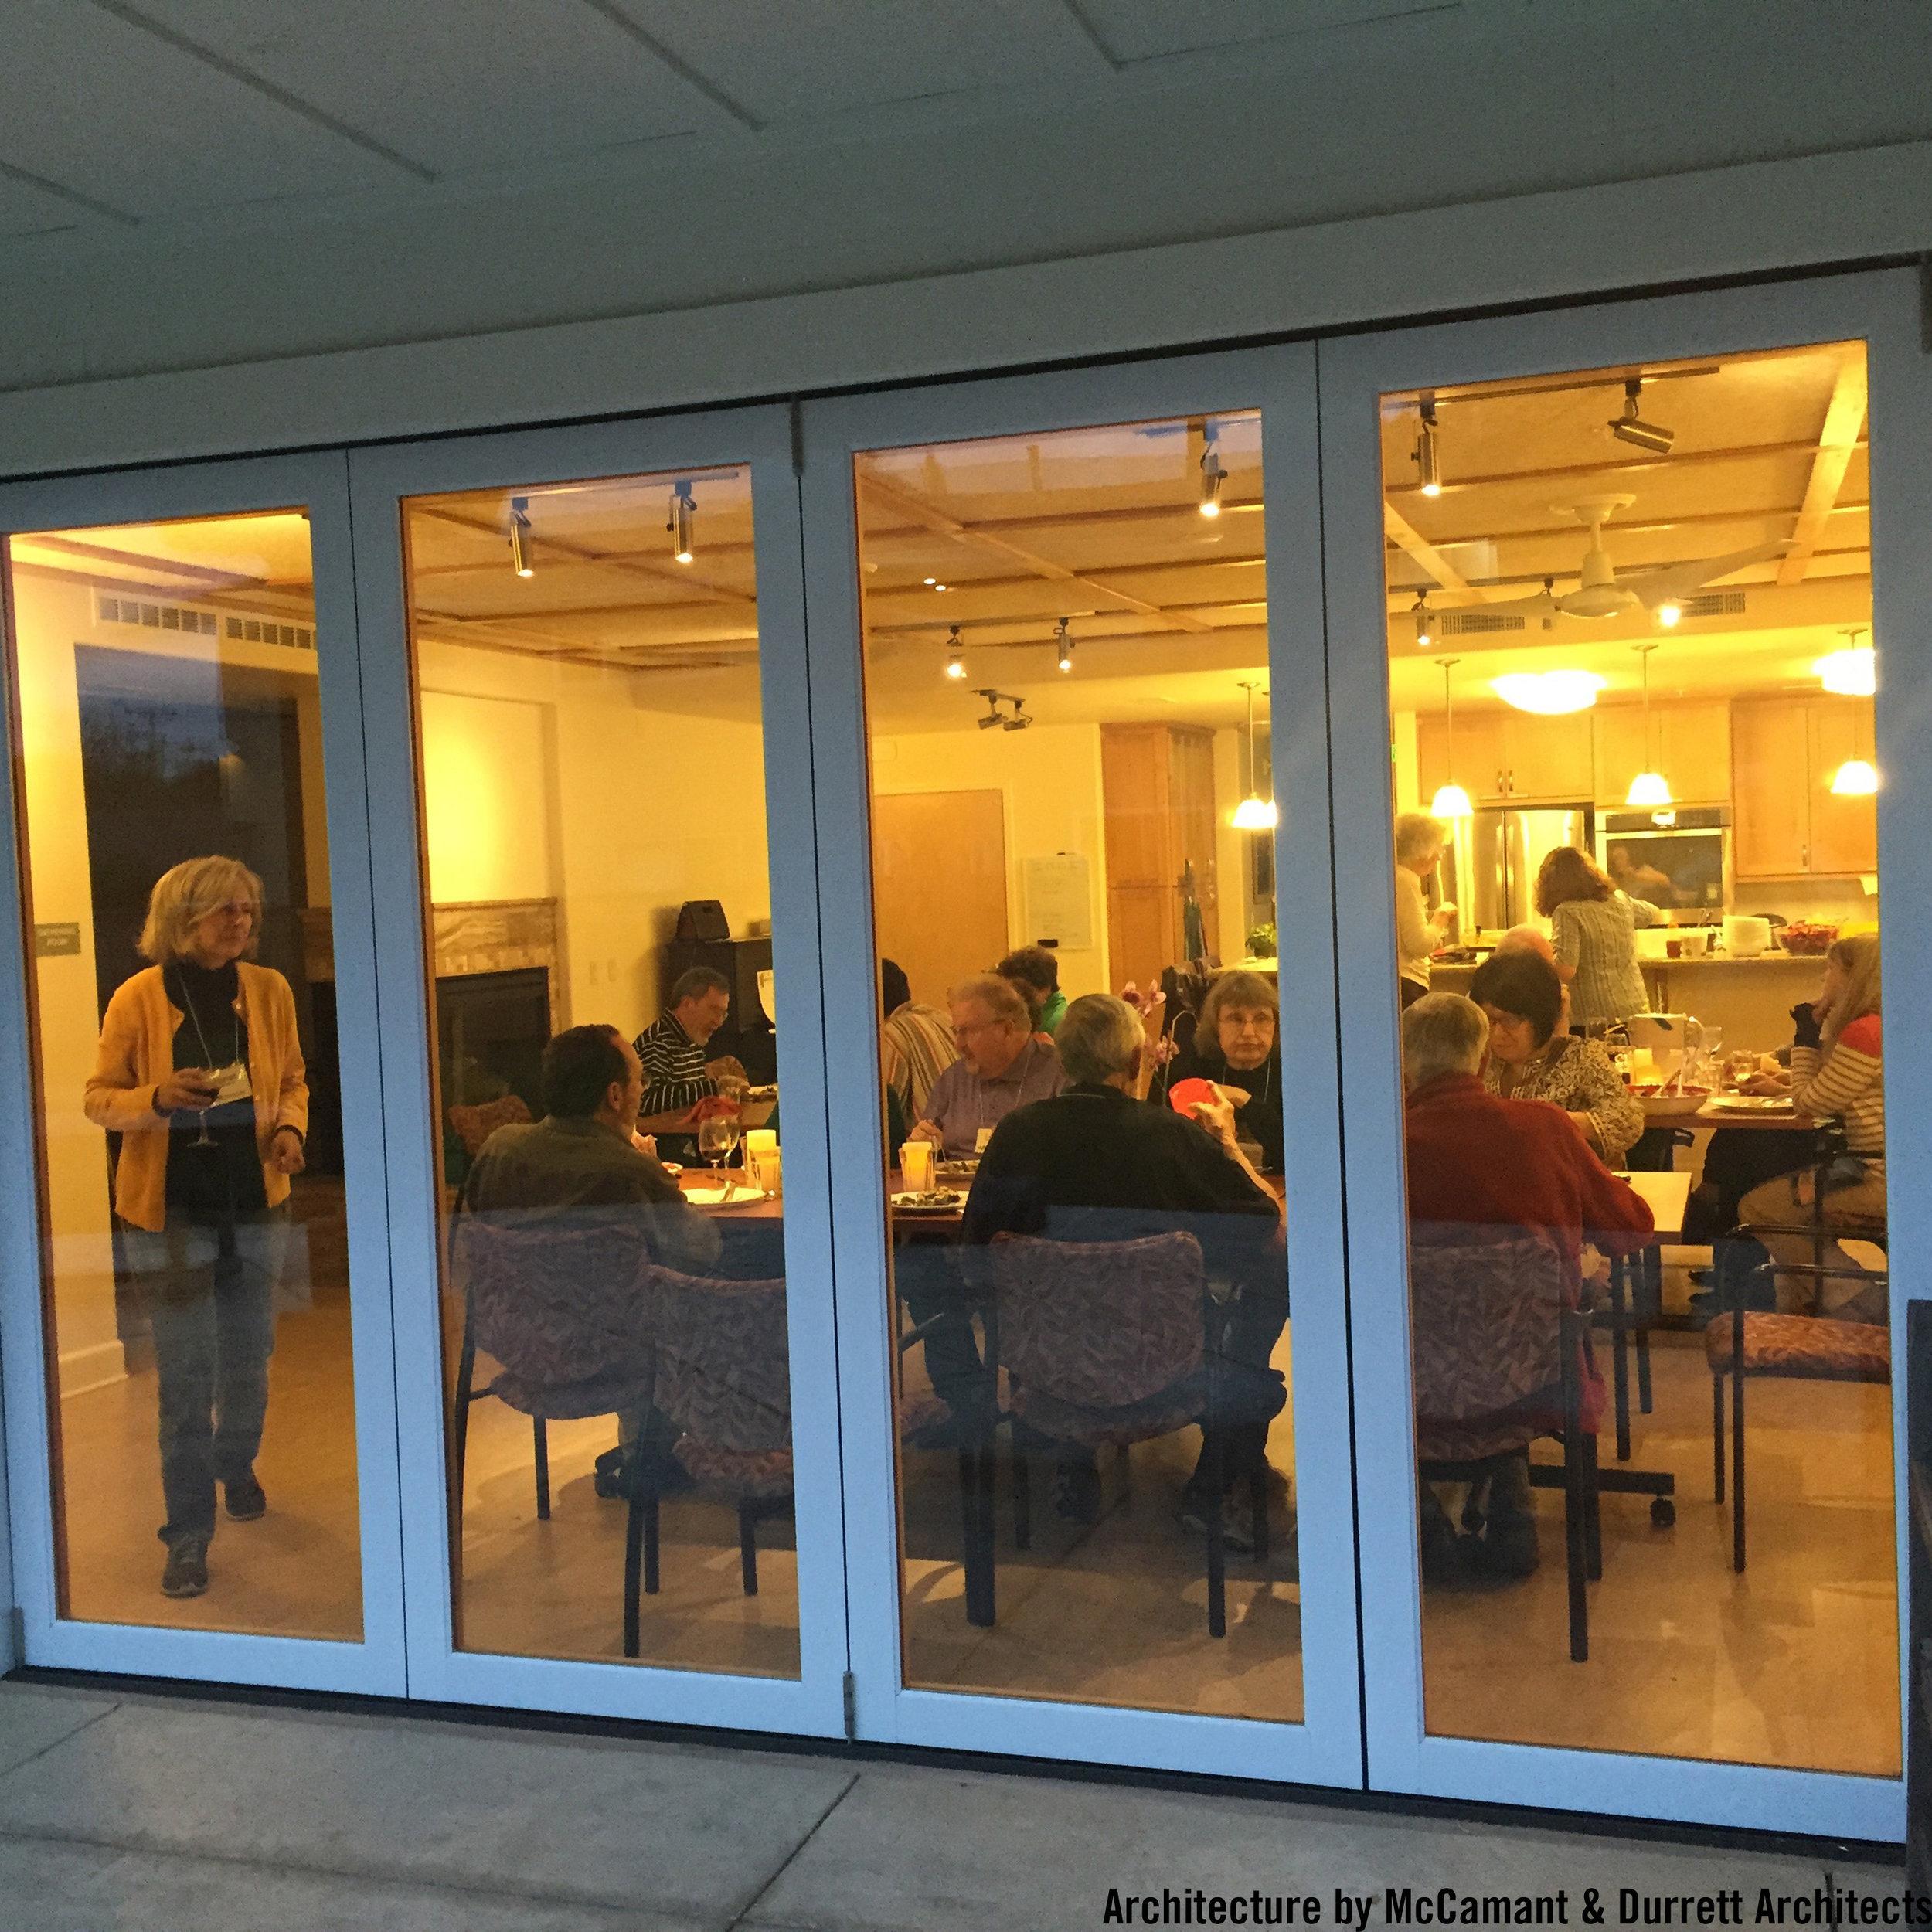 Quimper Village Senior Cohousing, Port Townsend, WA   |  Architecture by McCamant & Durrett Architects